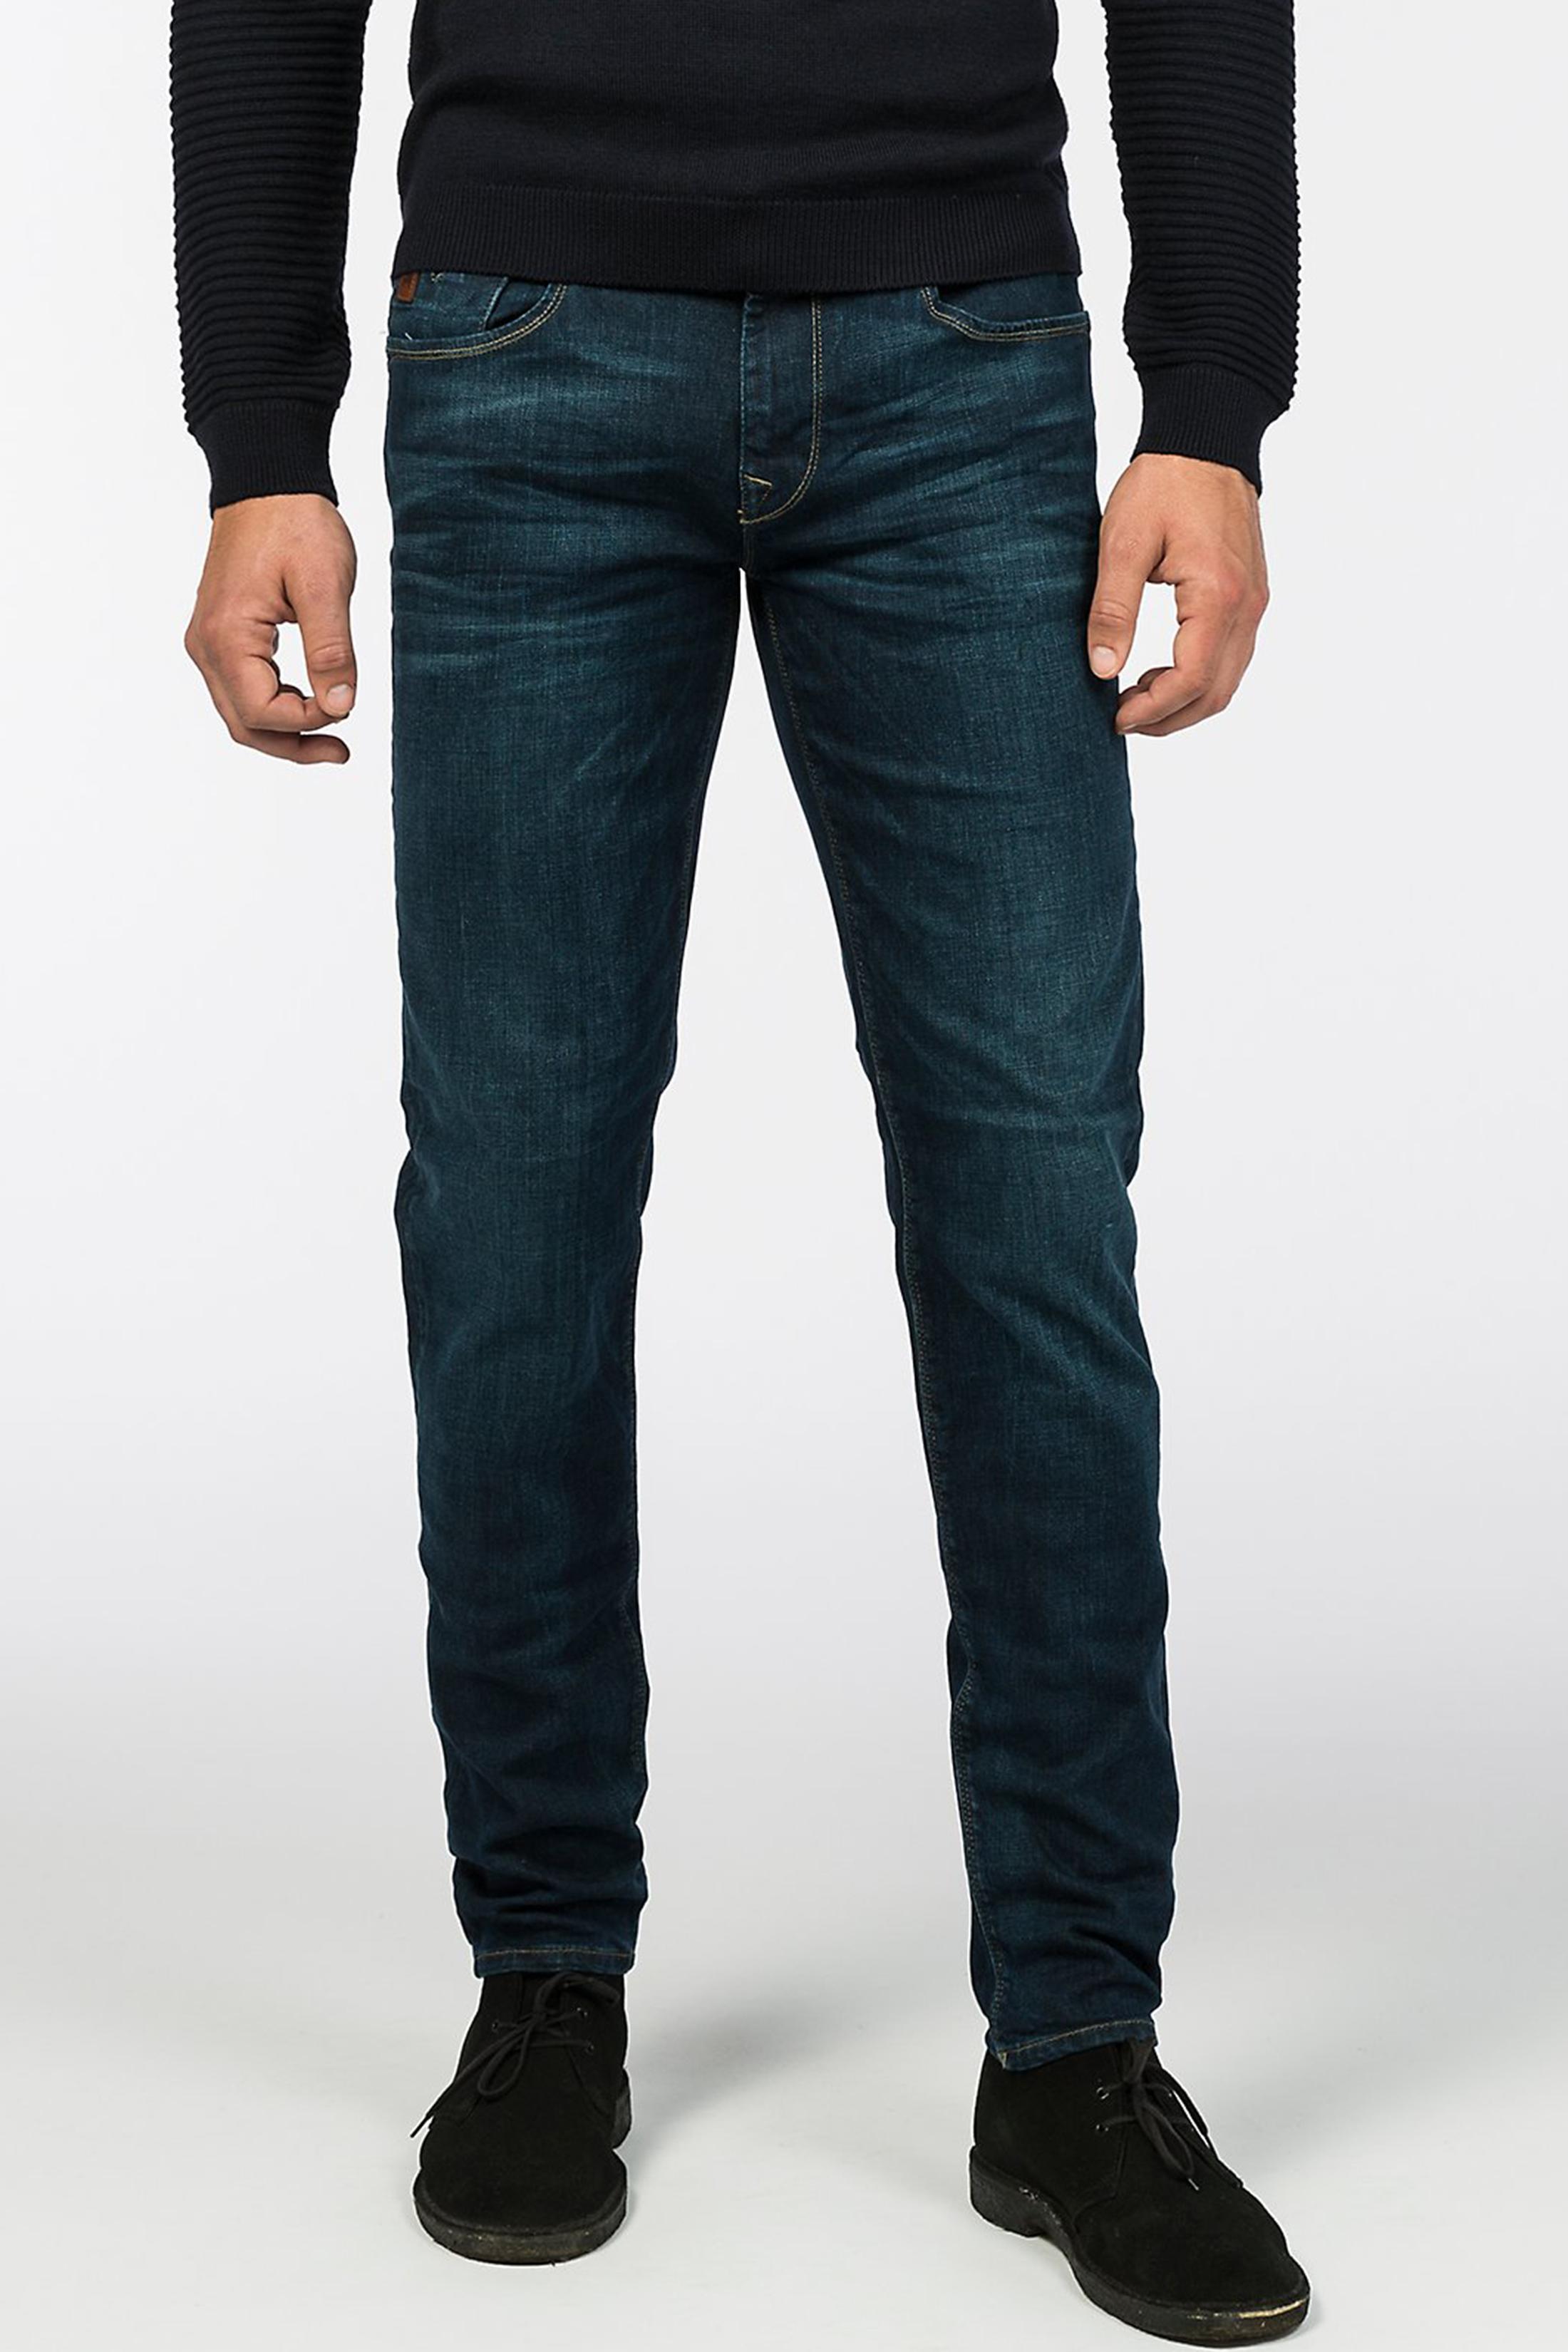 Vanguard Jeans V7 Rider Pure Blue foto 4